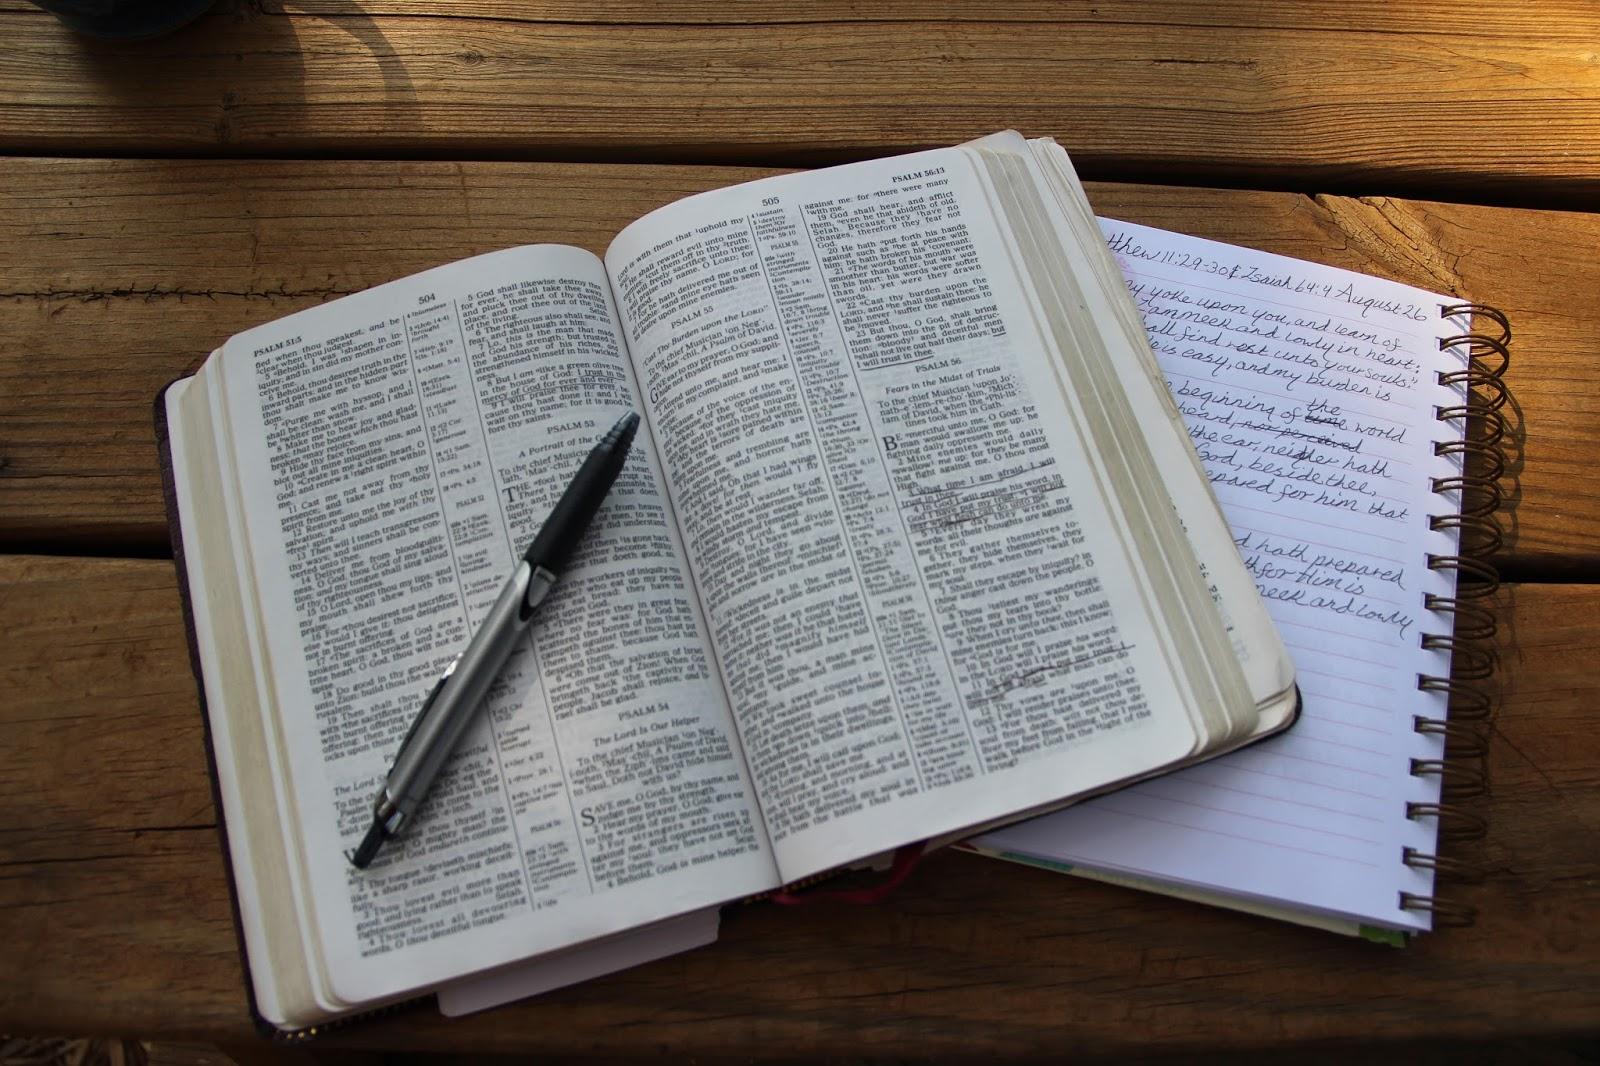 Httpwww Overlordsofchaos Comhtmlorigin Of The Word Jew Html: Honey Rock Hills : Bible Study Methods: Topical Studies